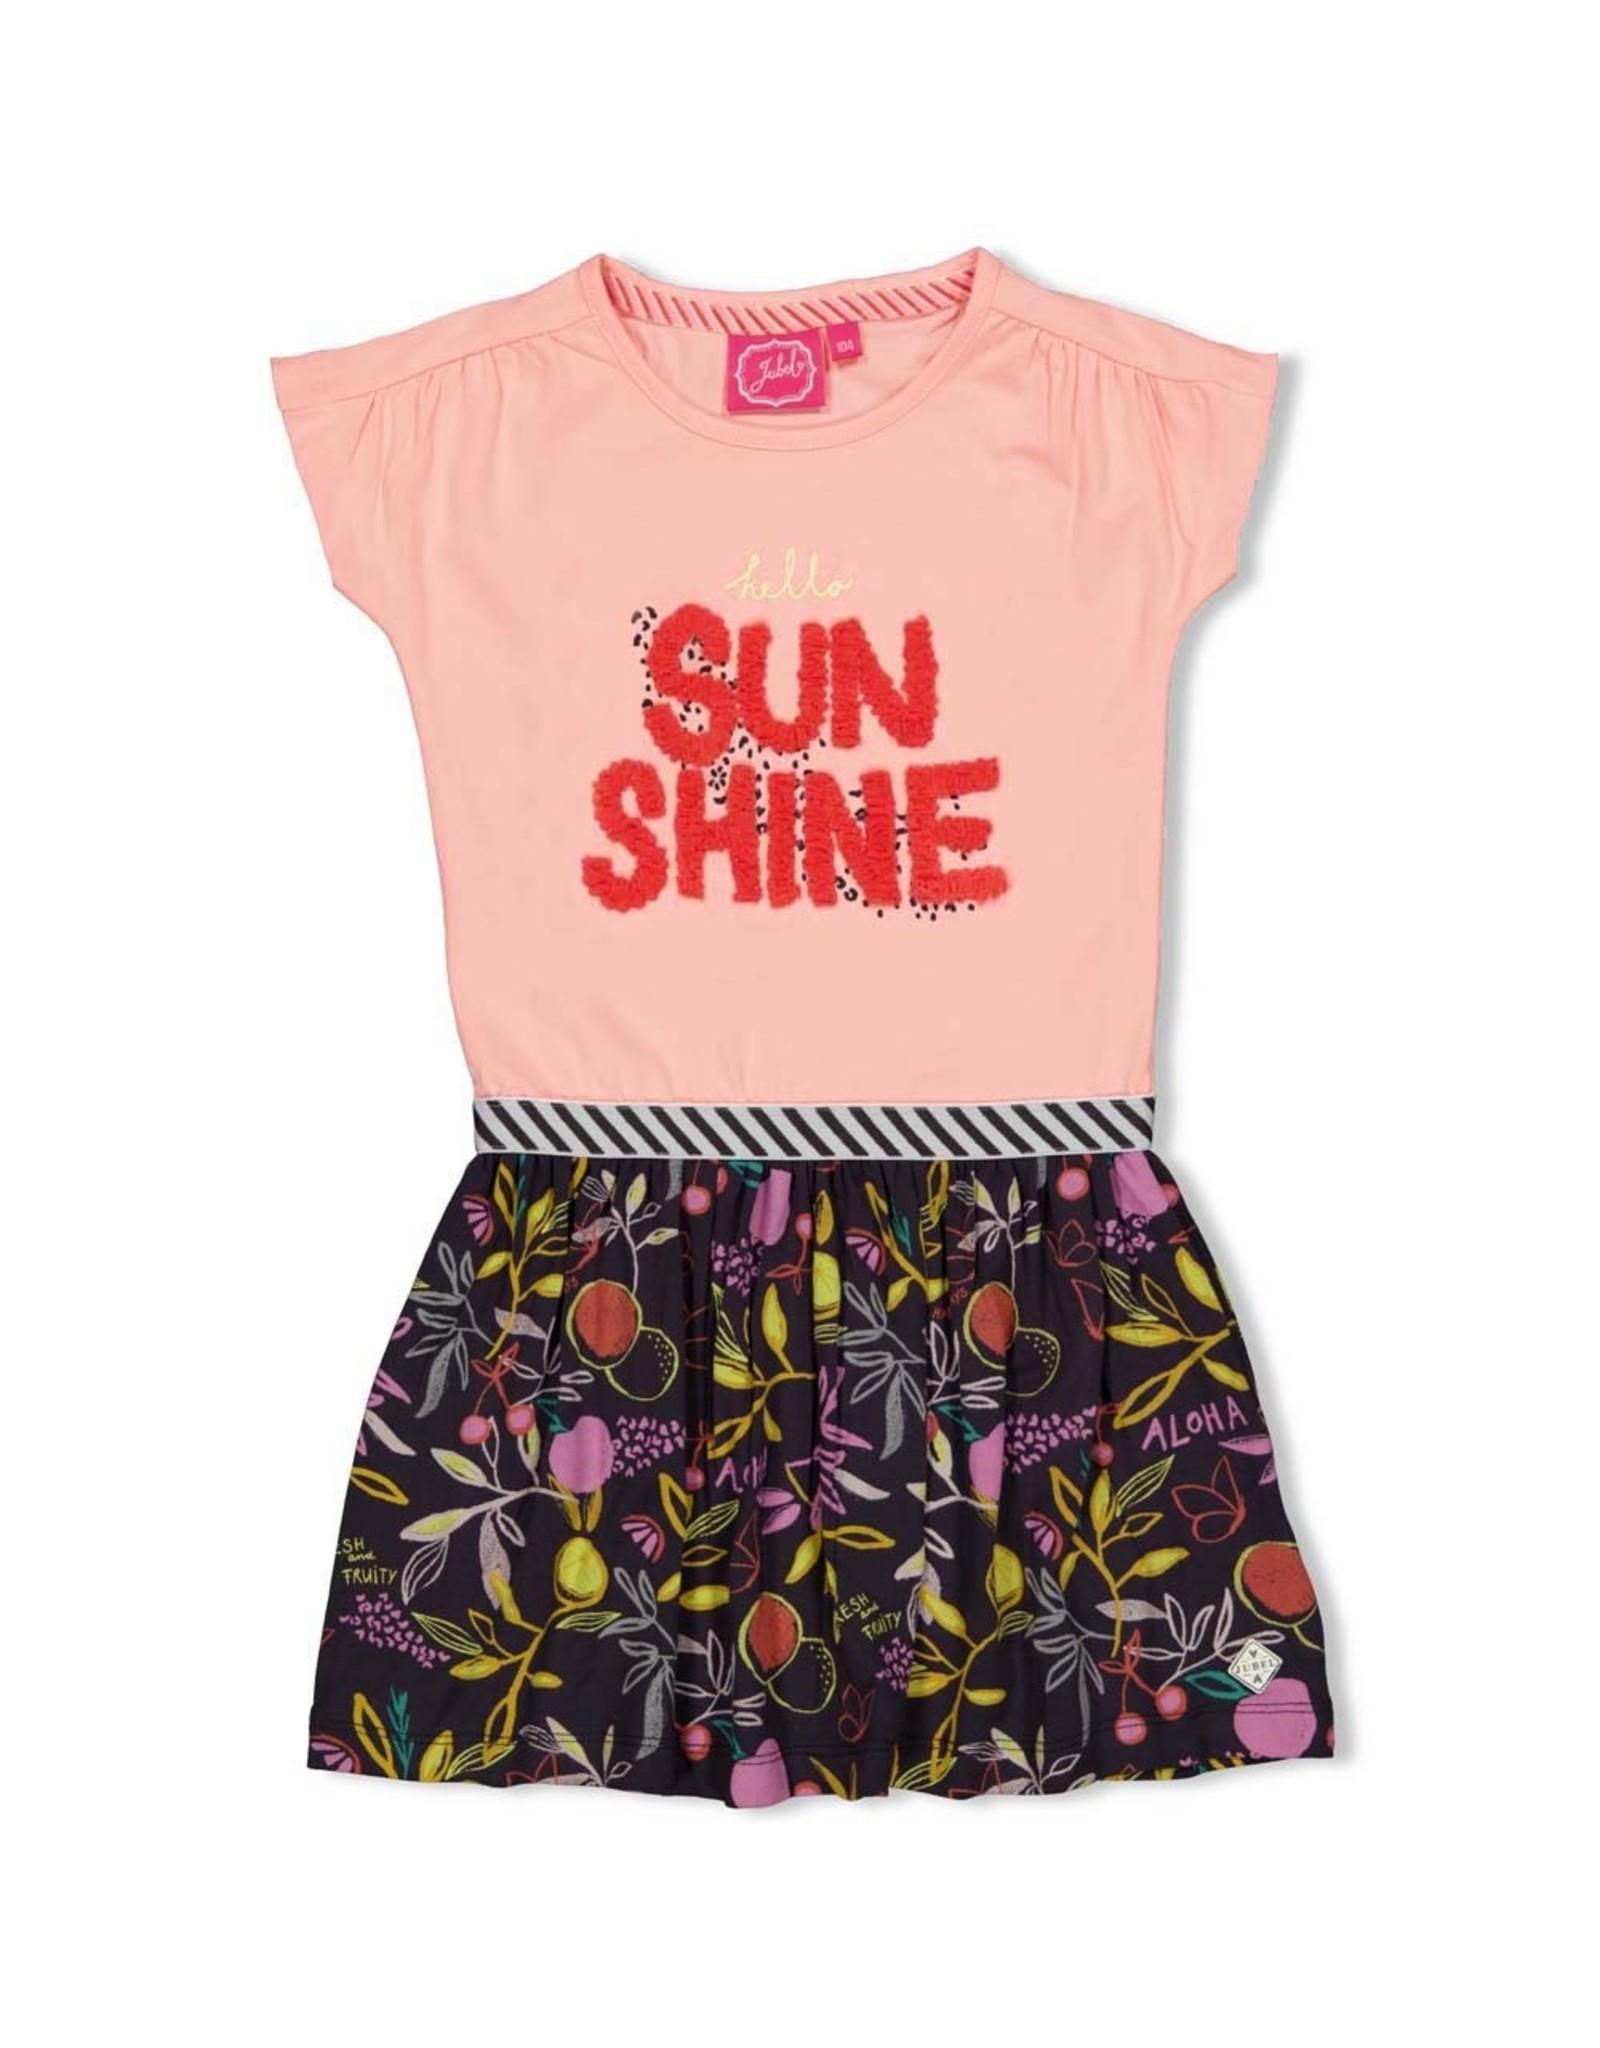 Jubel Jurk Sunshine - Tutti Frutti. Roze